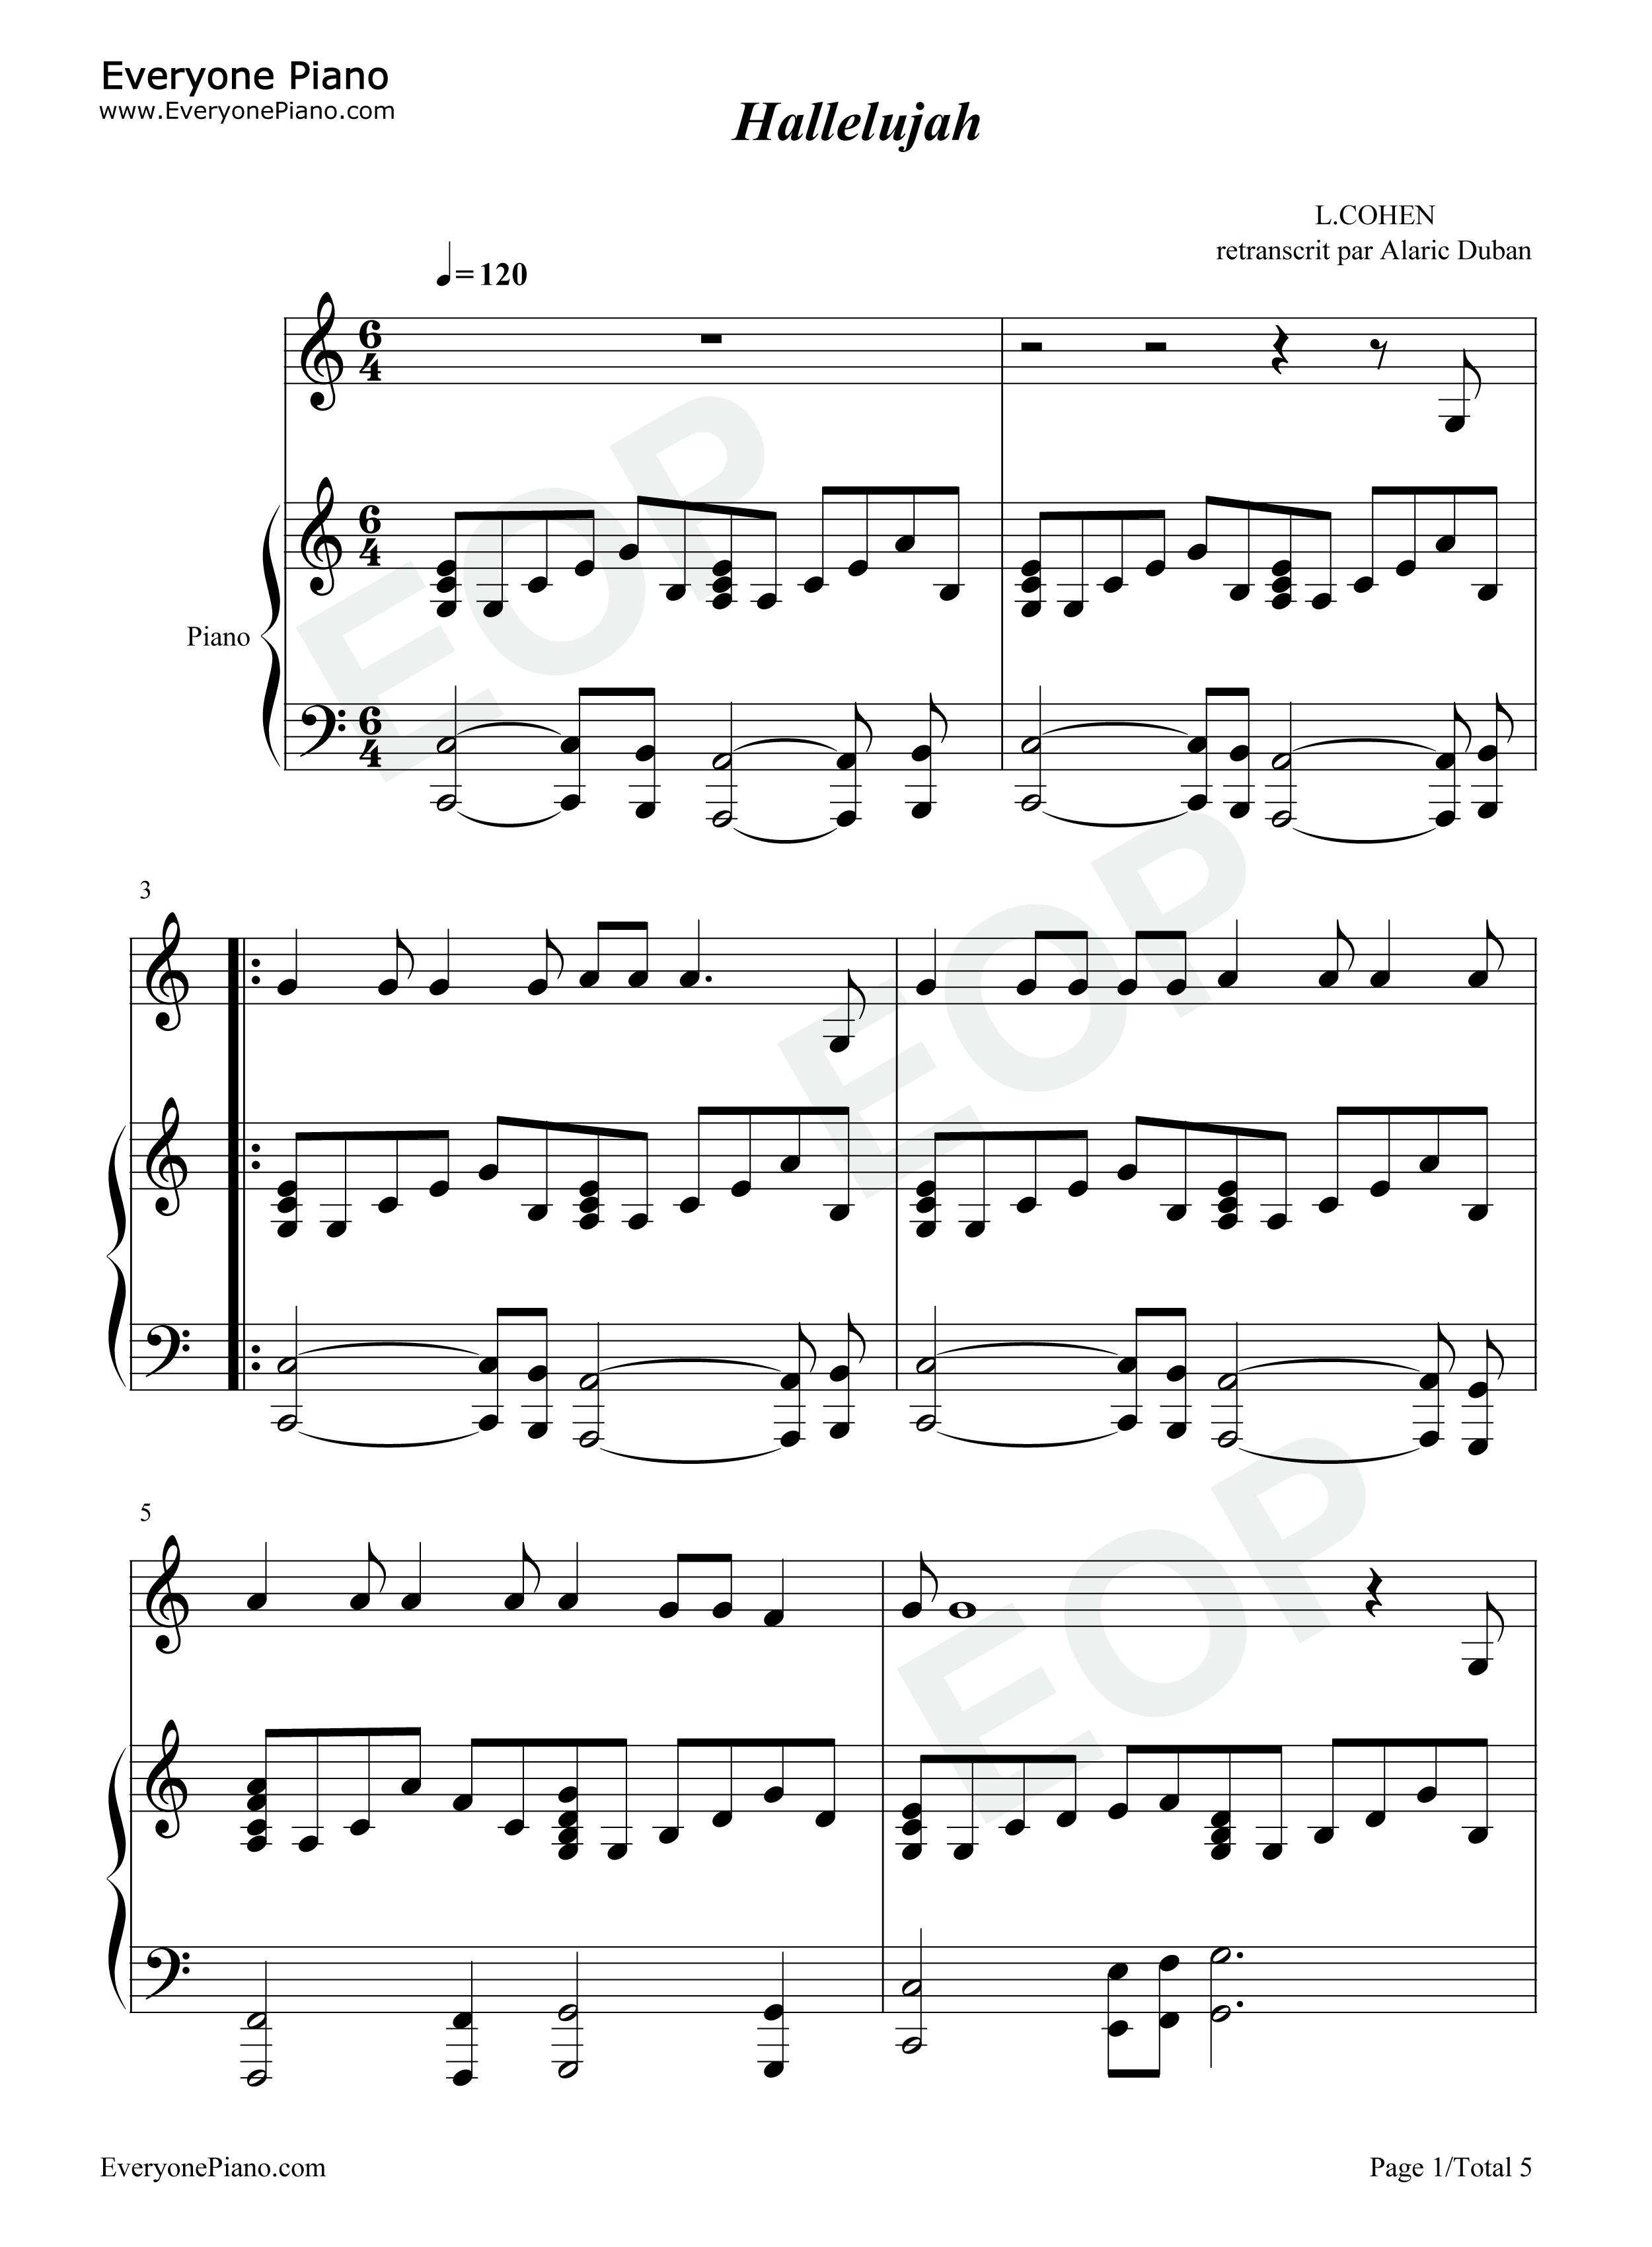 chionese breakdown chords and lyrics pdf chords and lyrics pdf